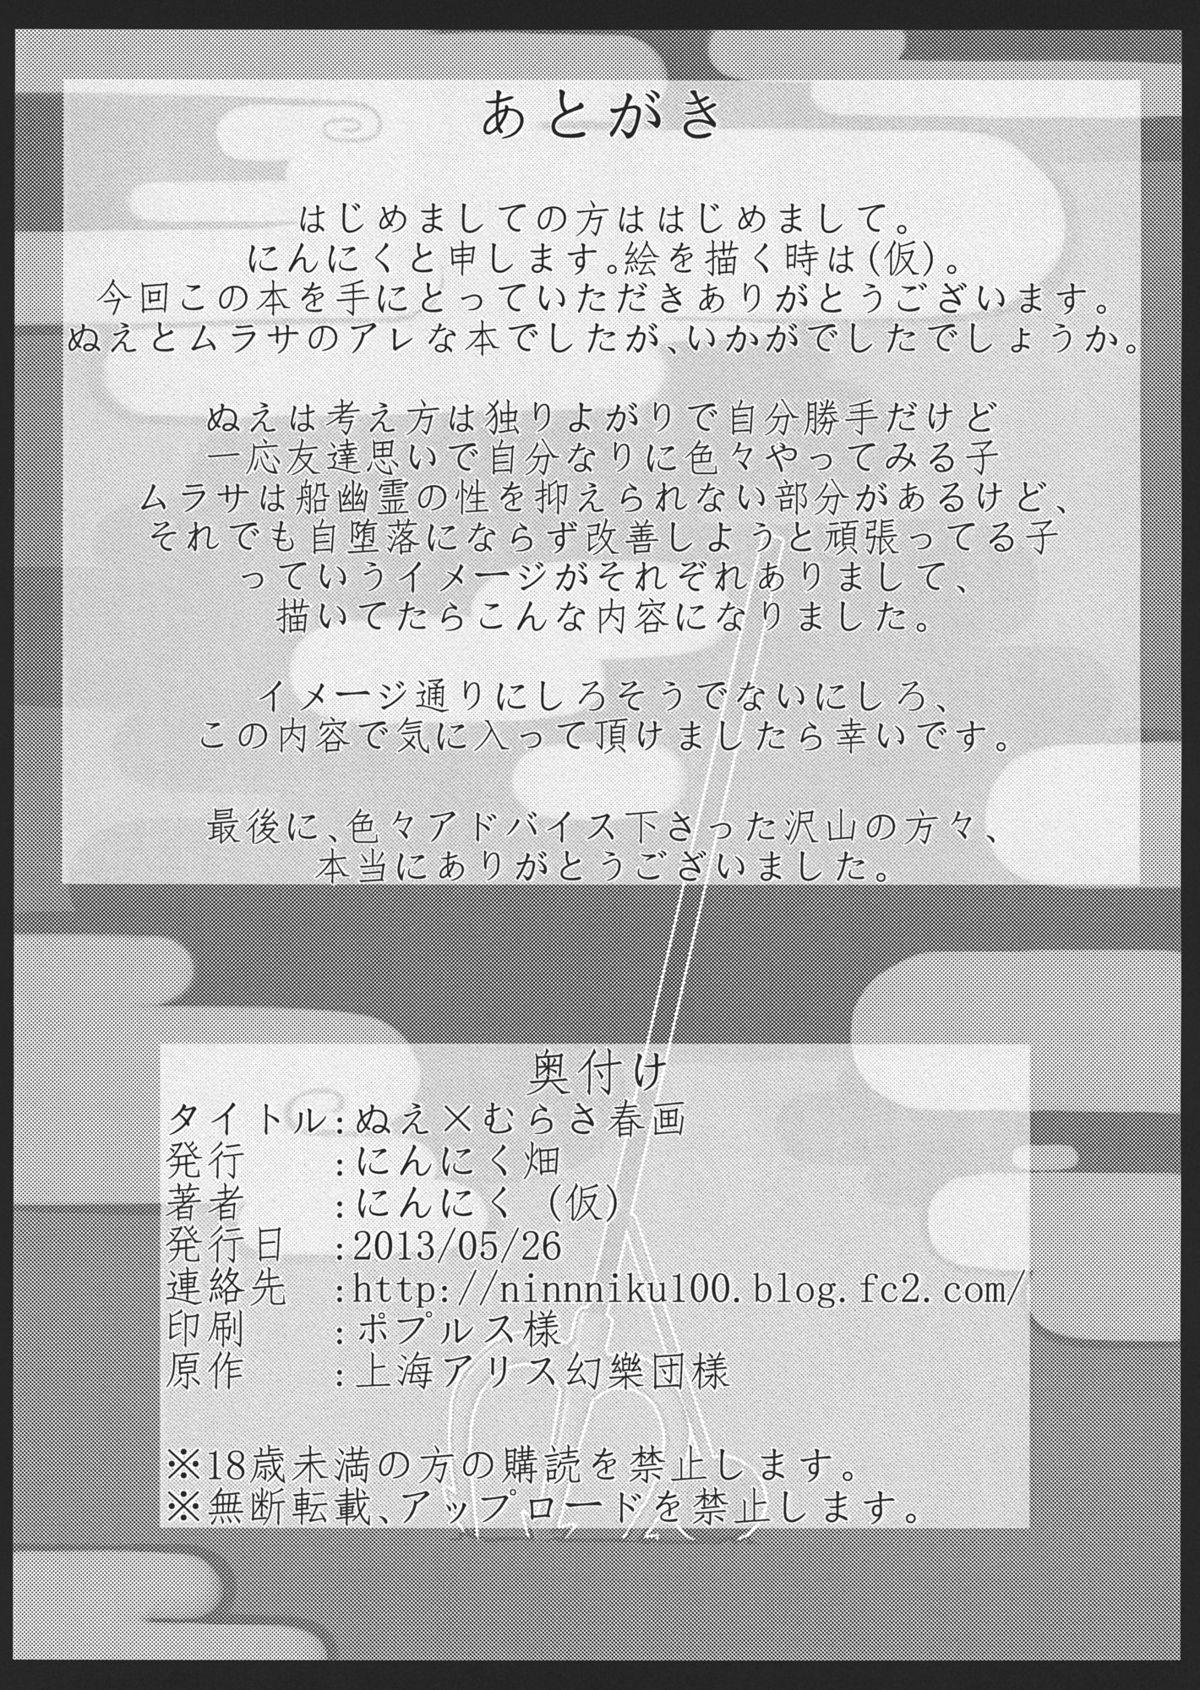 Nue x Murasa Shunga 25